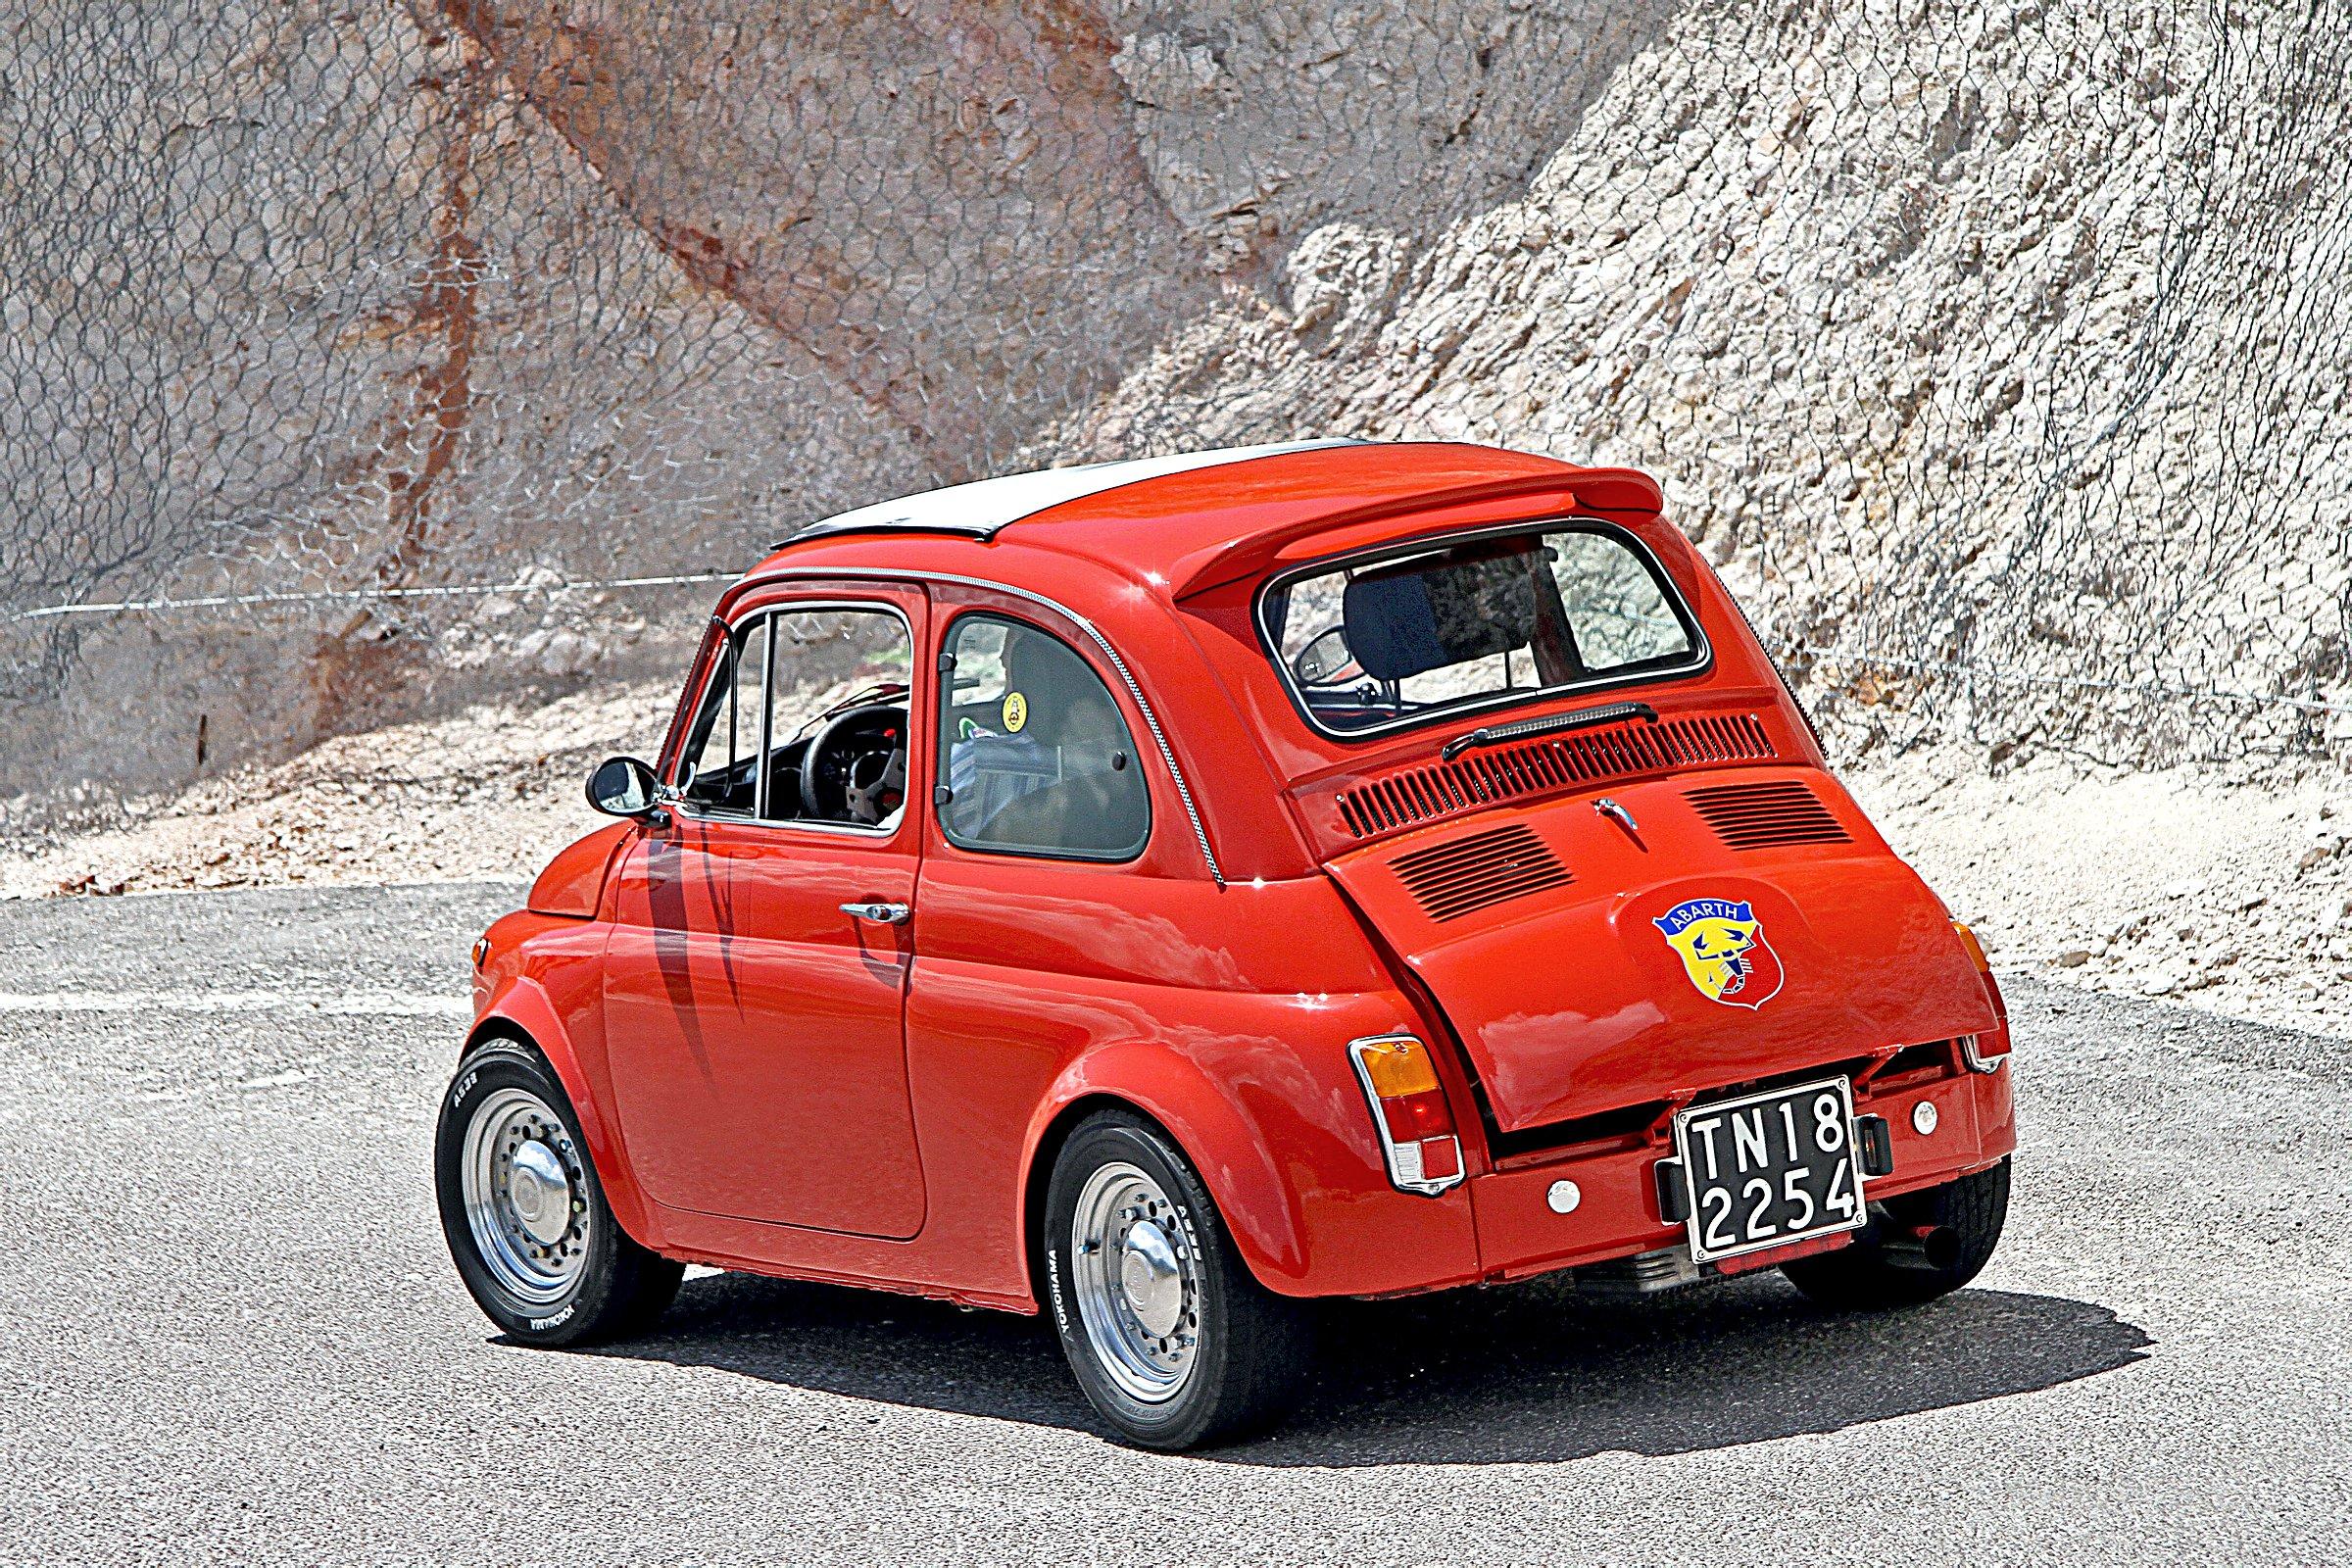 fiat cinquecento 500 595 abarth mk1 cars classic italia italie wallpaper 2400x1600 603072. Black Bedroom Furniture Sets. Home Design Ideas